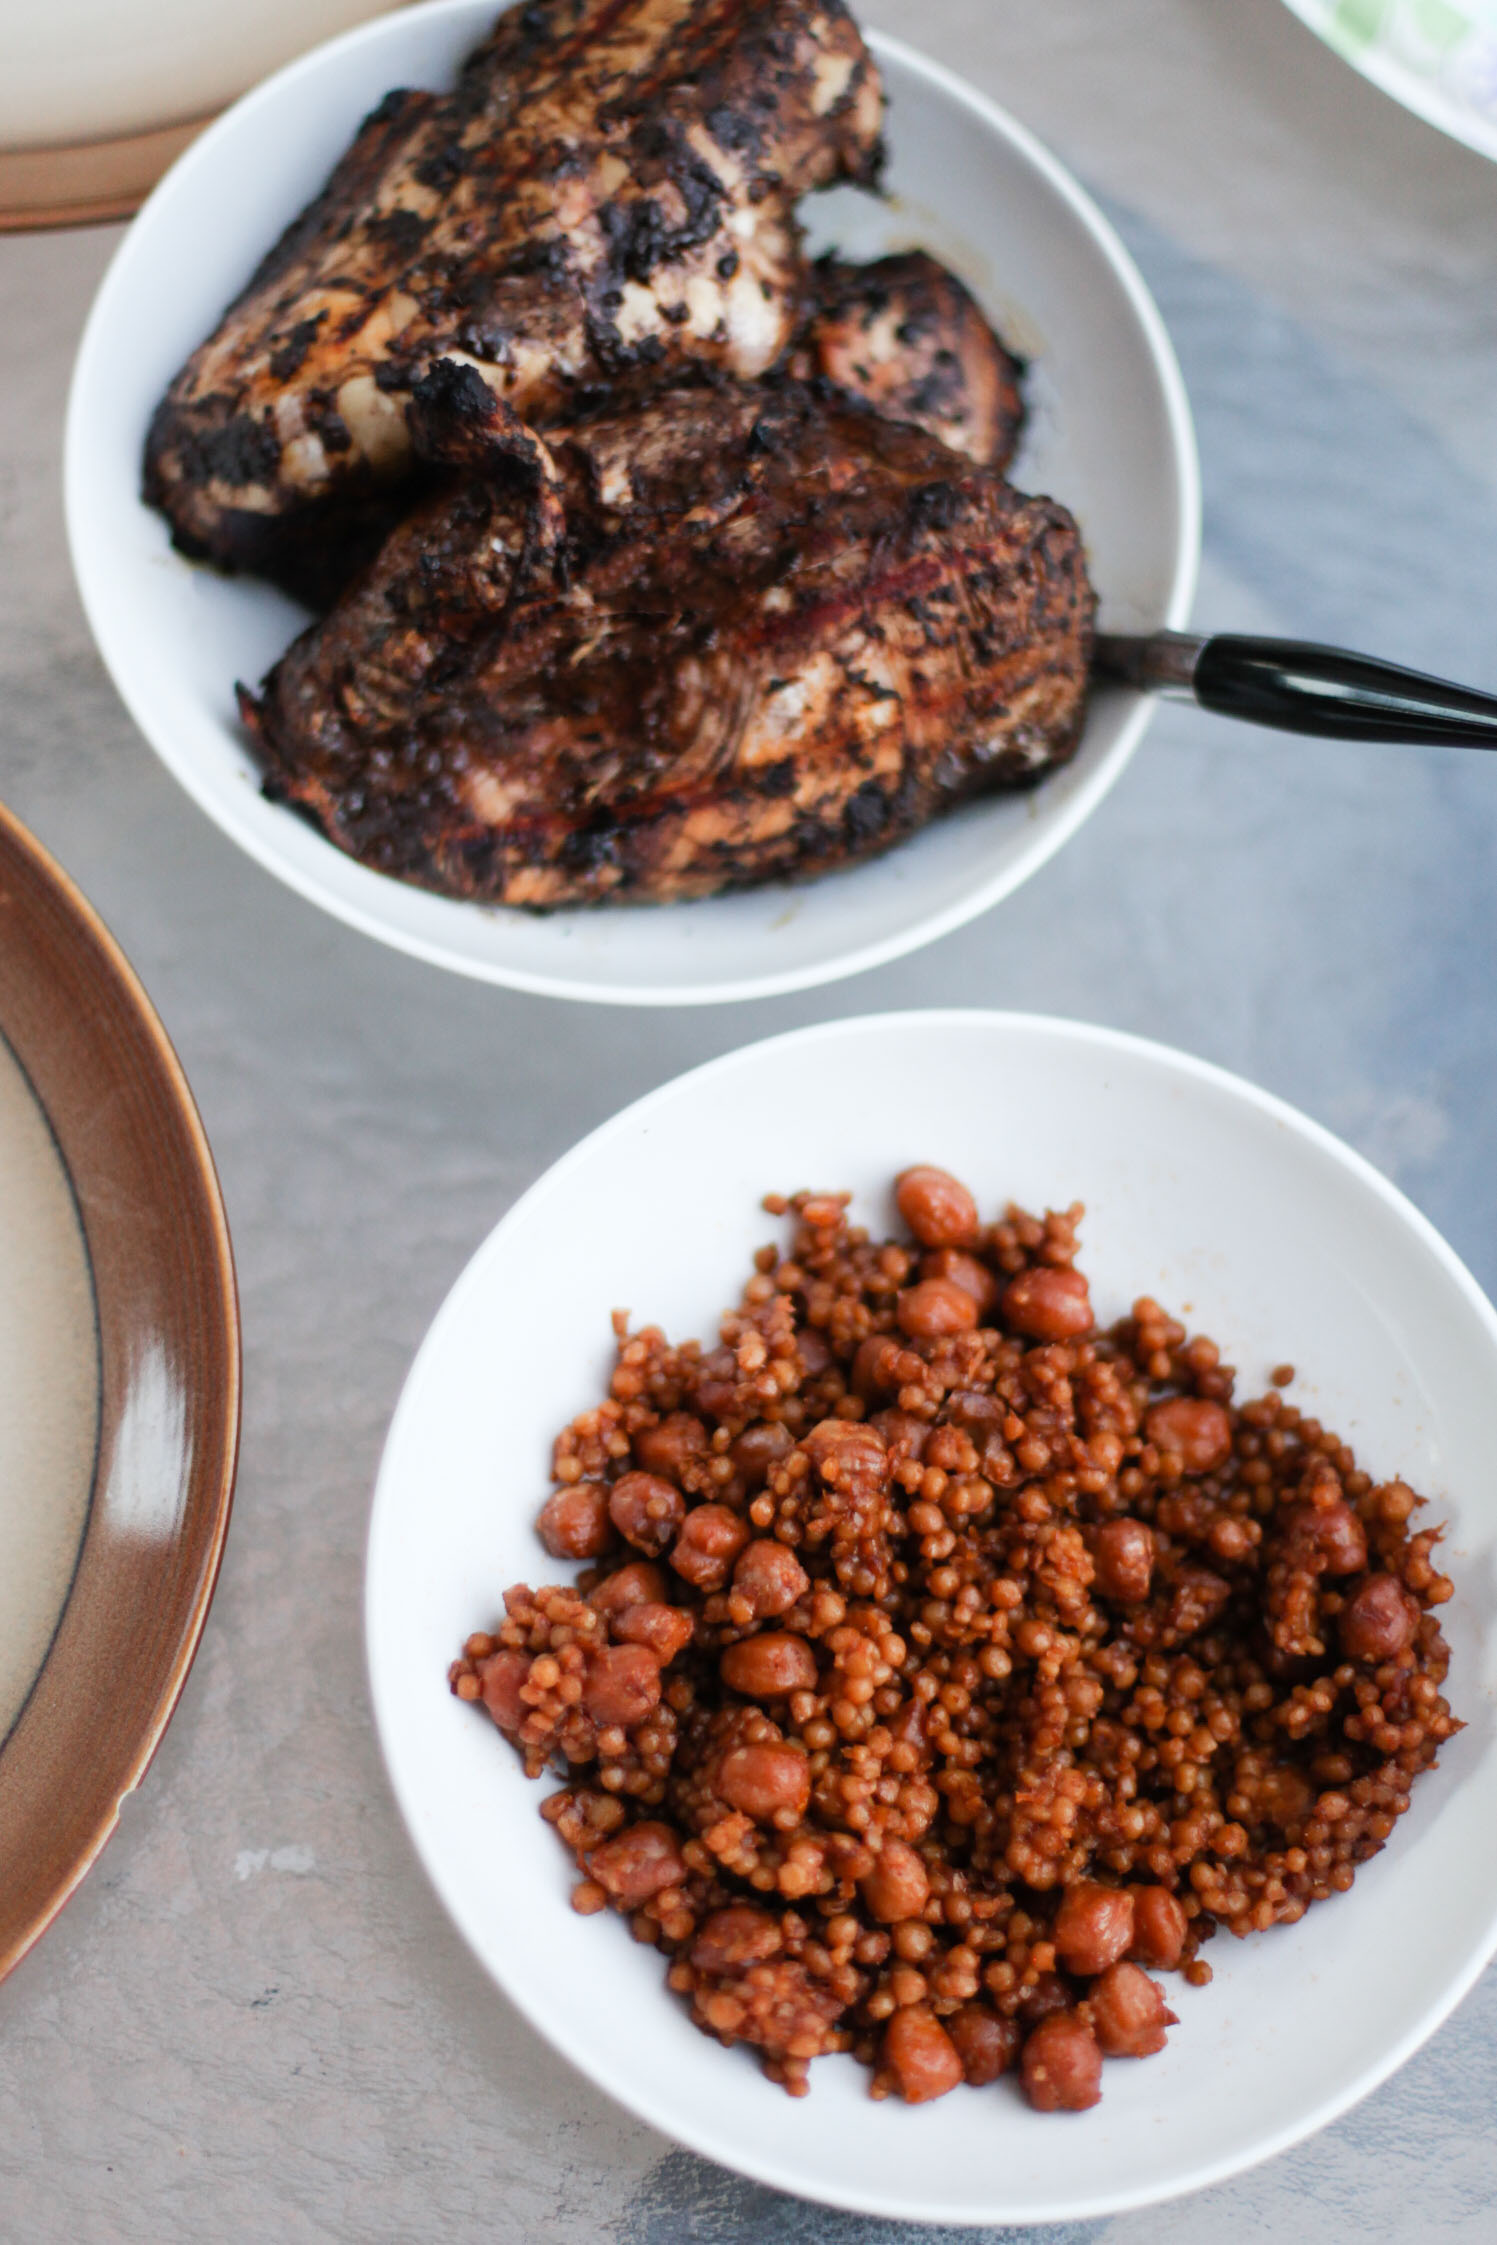 SUPER easy Mediterranean recipe!